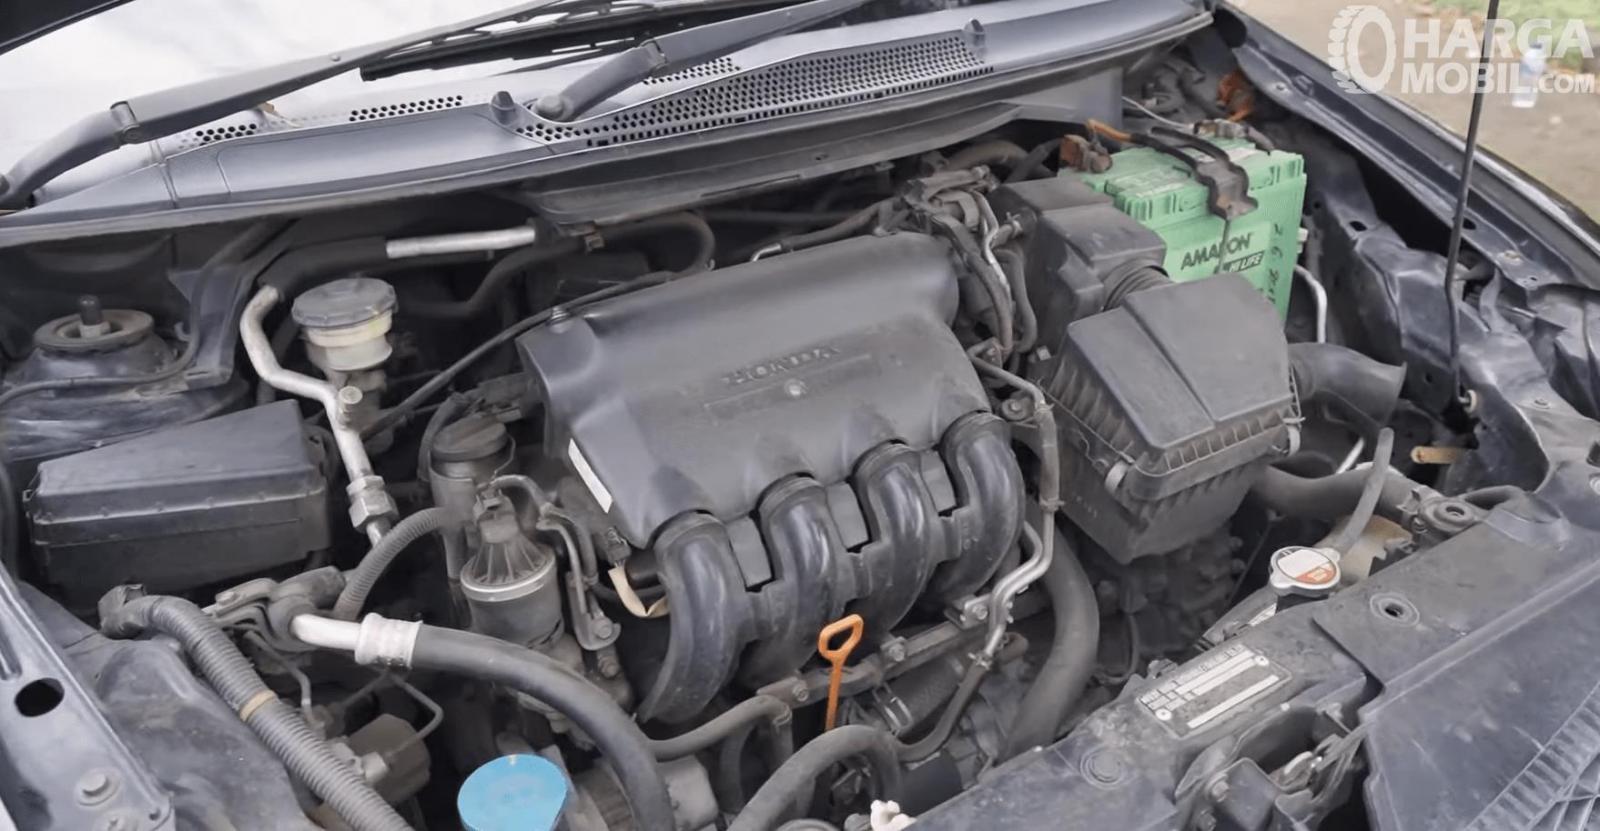 Gambar ini menunjukkan mesin mobil Honda City i-DSI CVT 2008